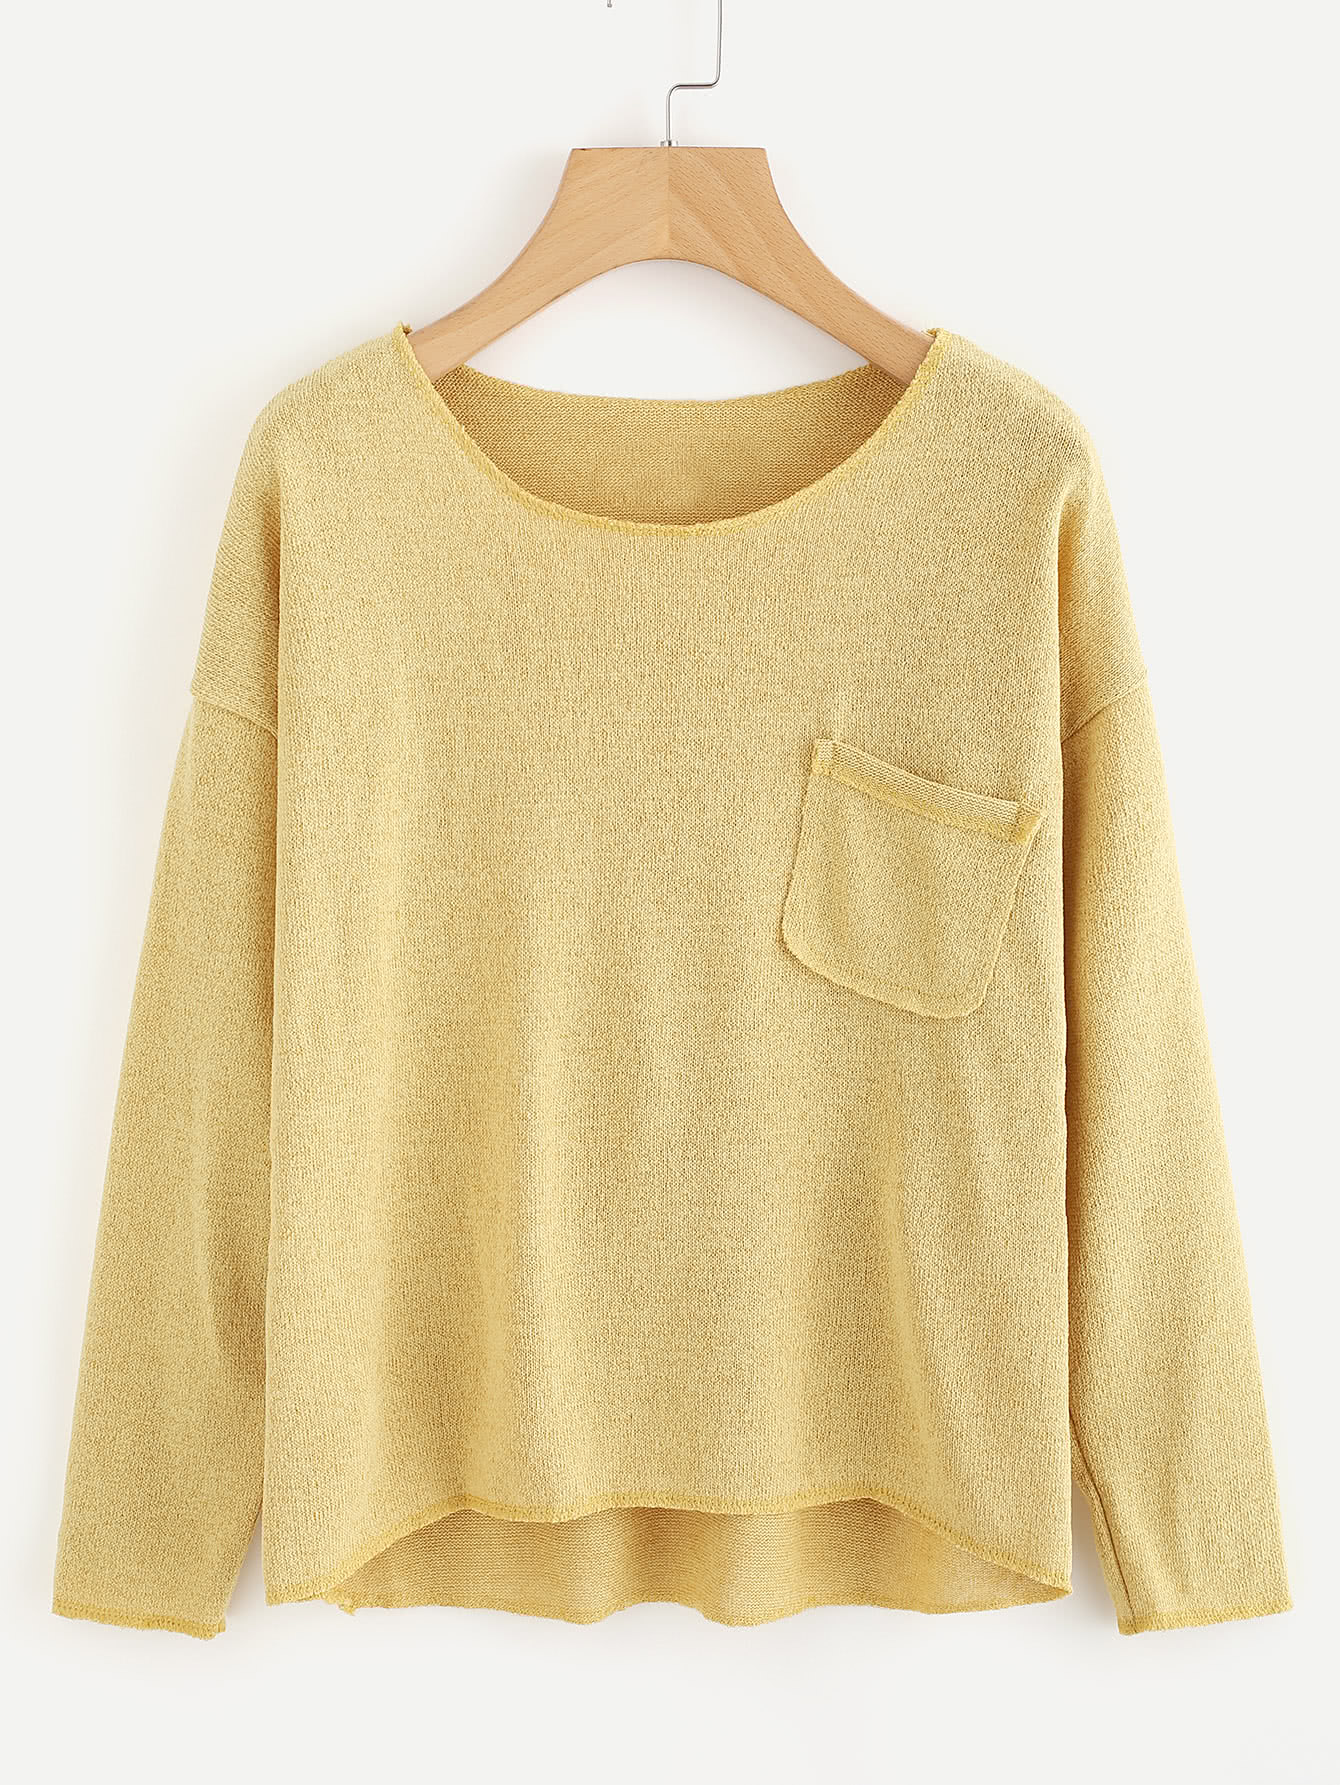 Drop Shoulder Chest Pocket Knit T-shirt two tone drop shoulder sweatshirt